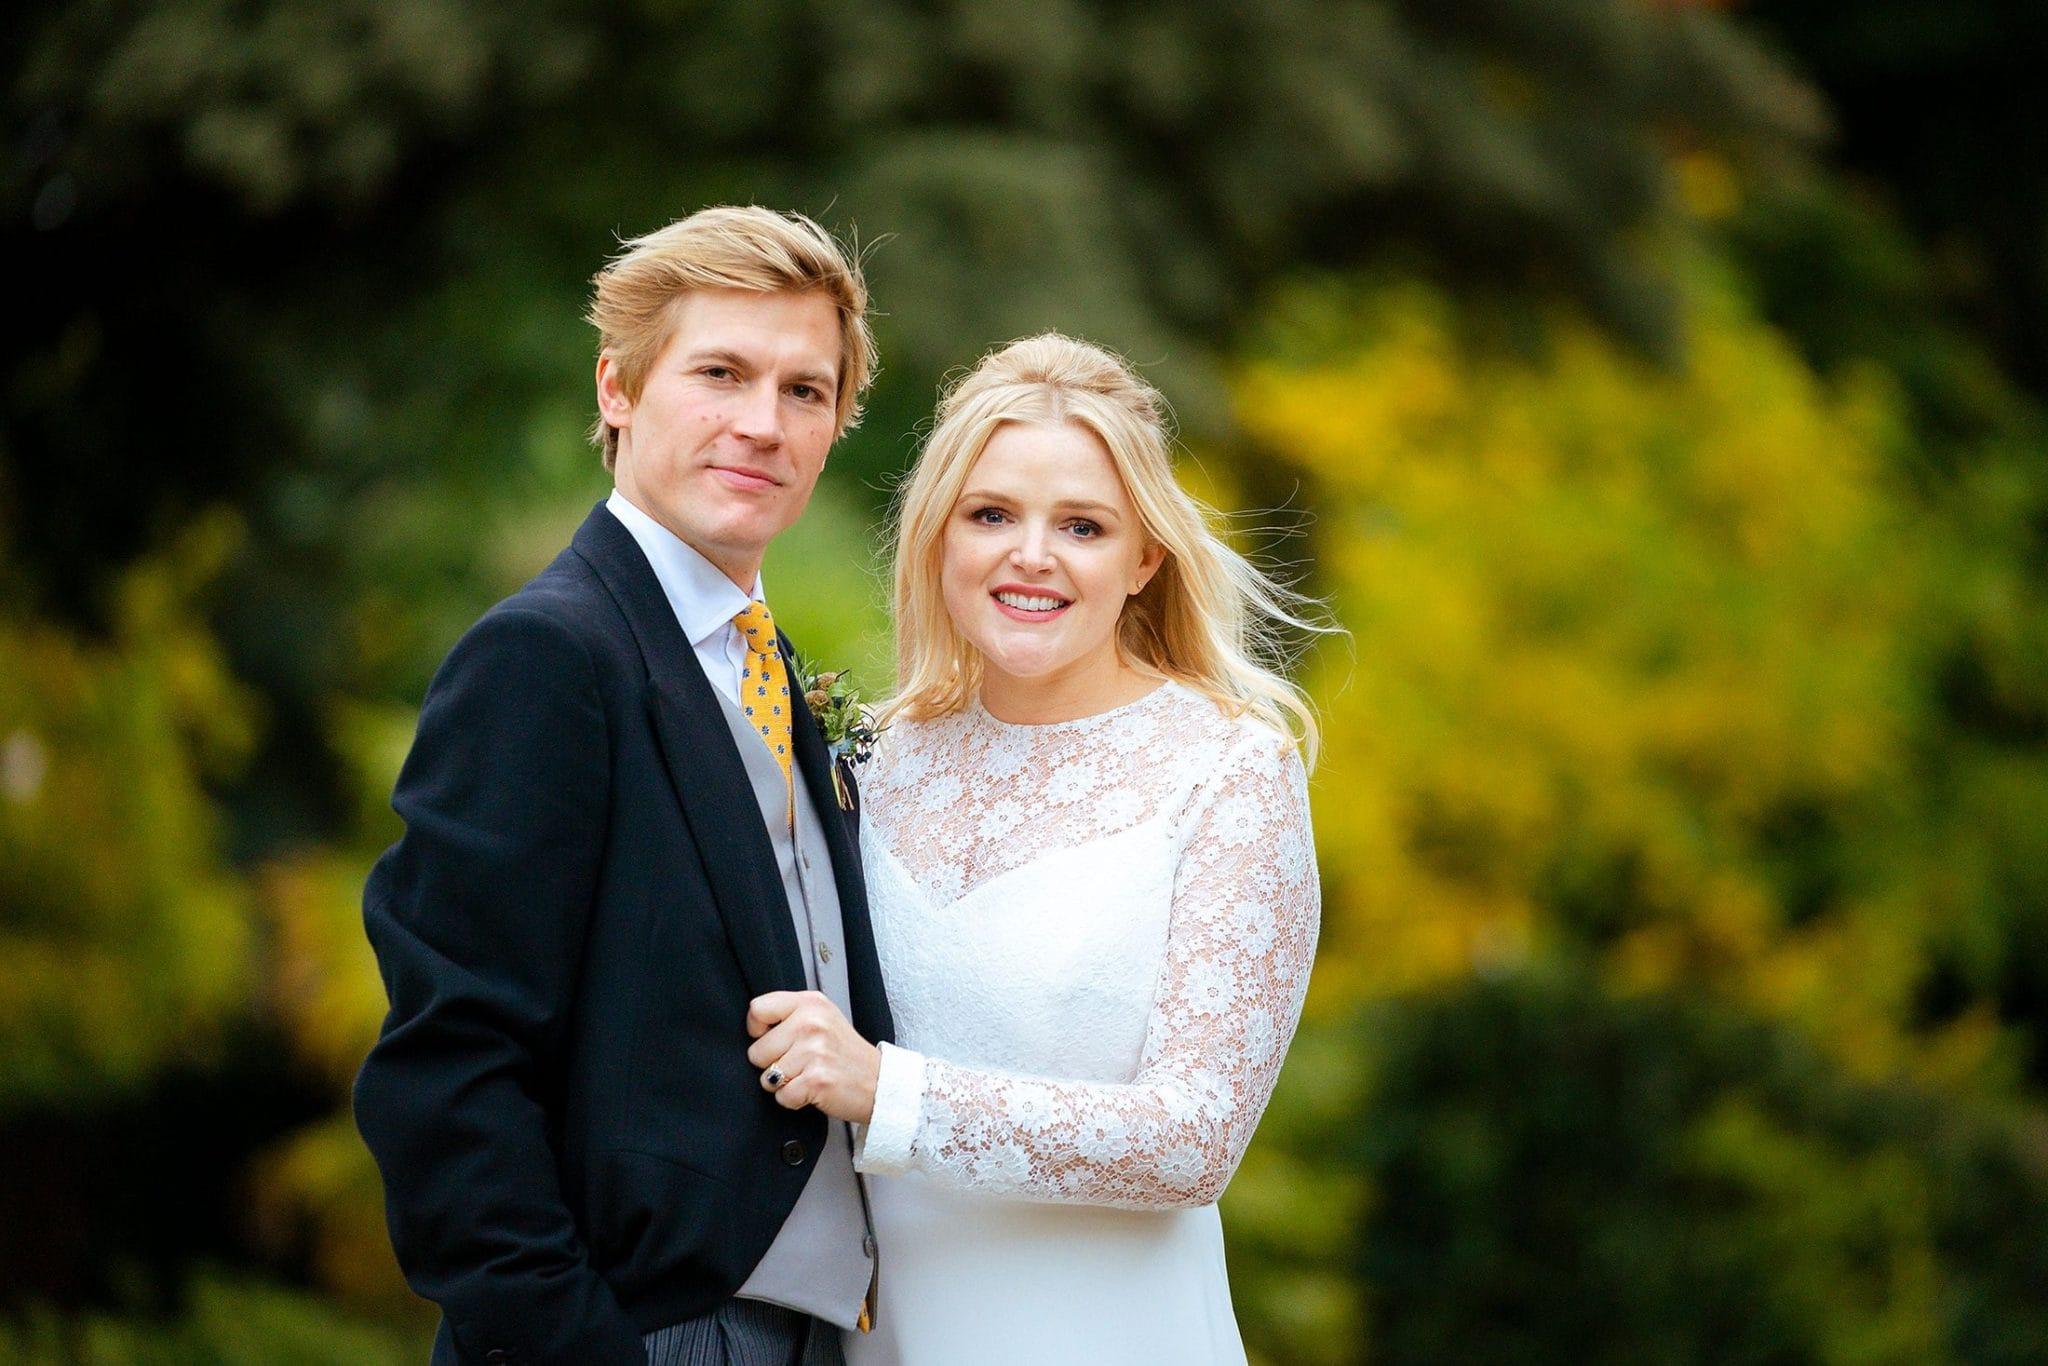 Syon Park wedding photography | Lizzie & Tom